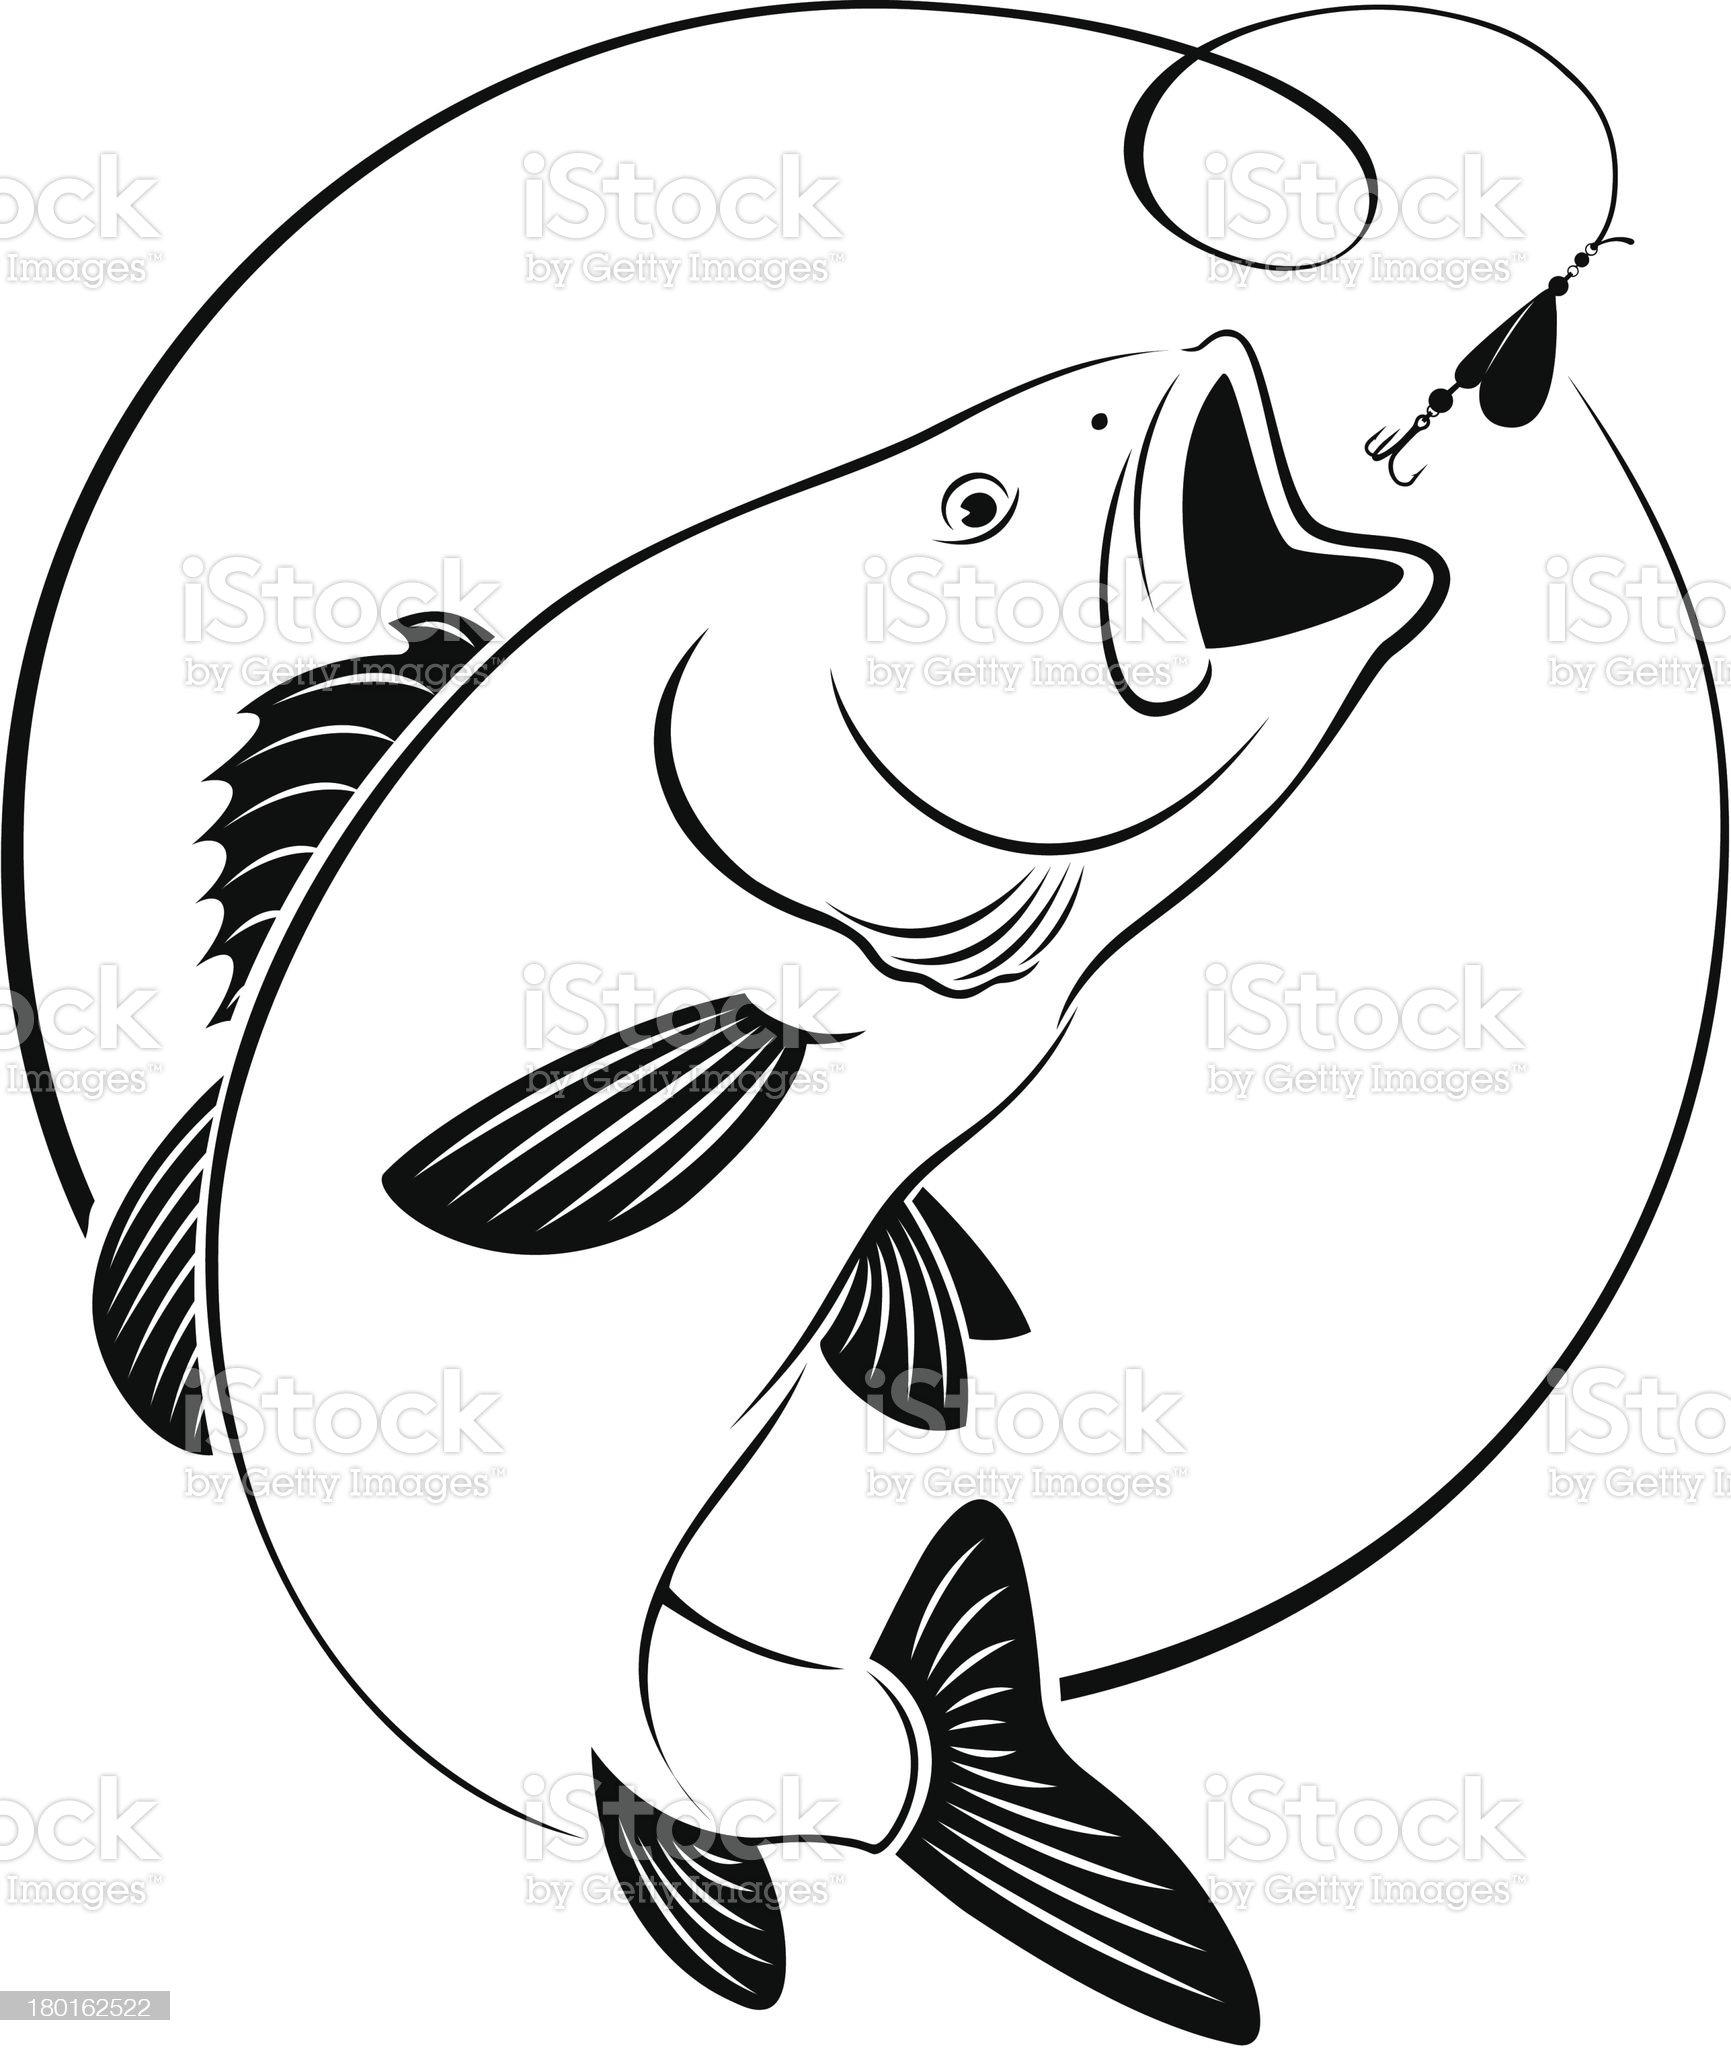 fish bass royalty-free stock vector art